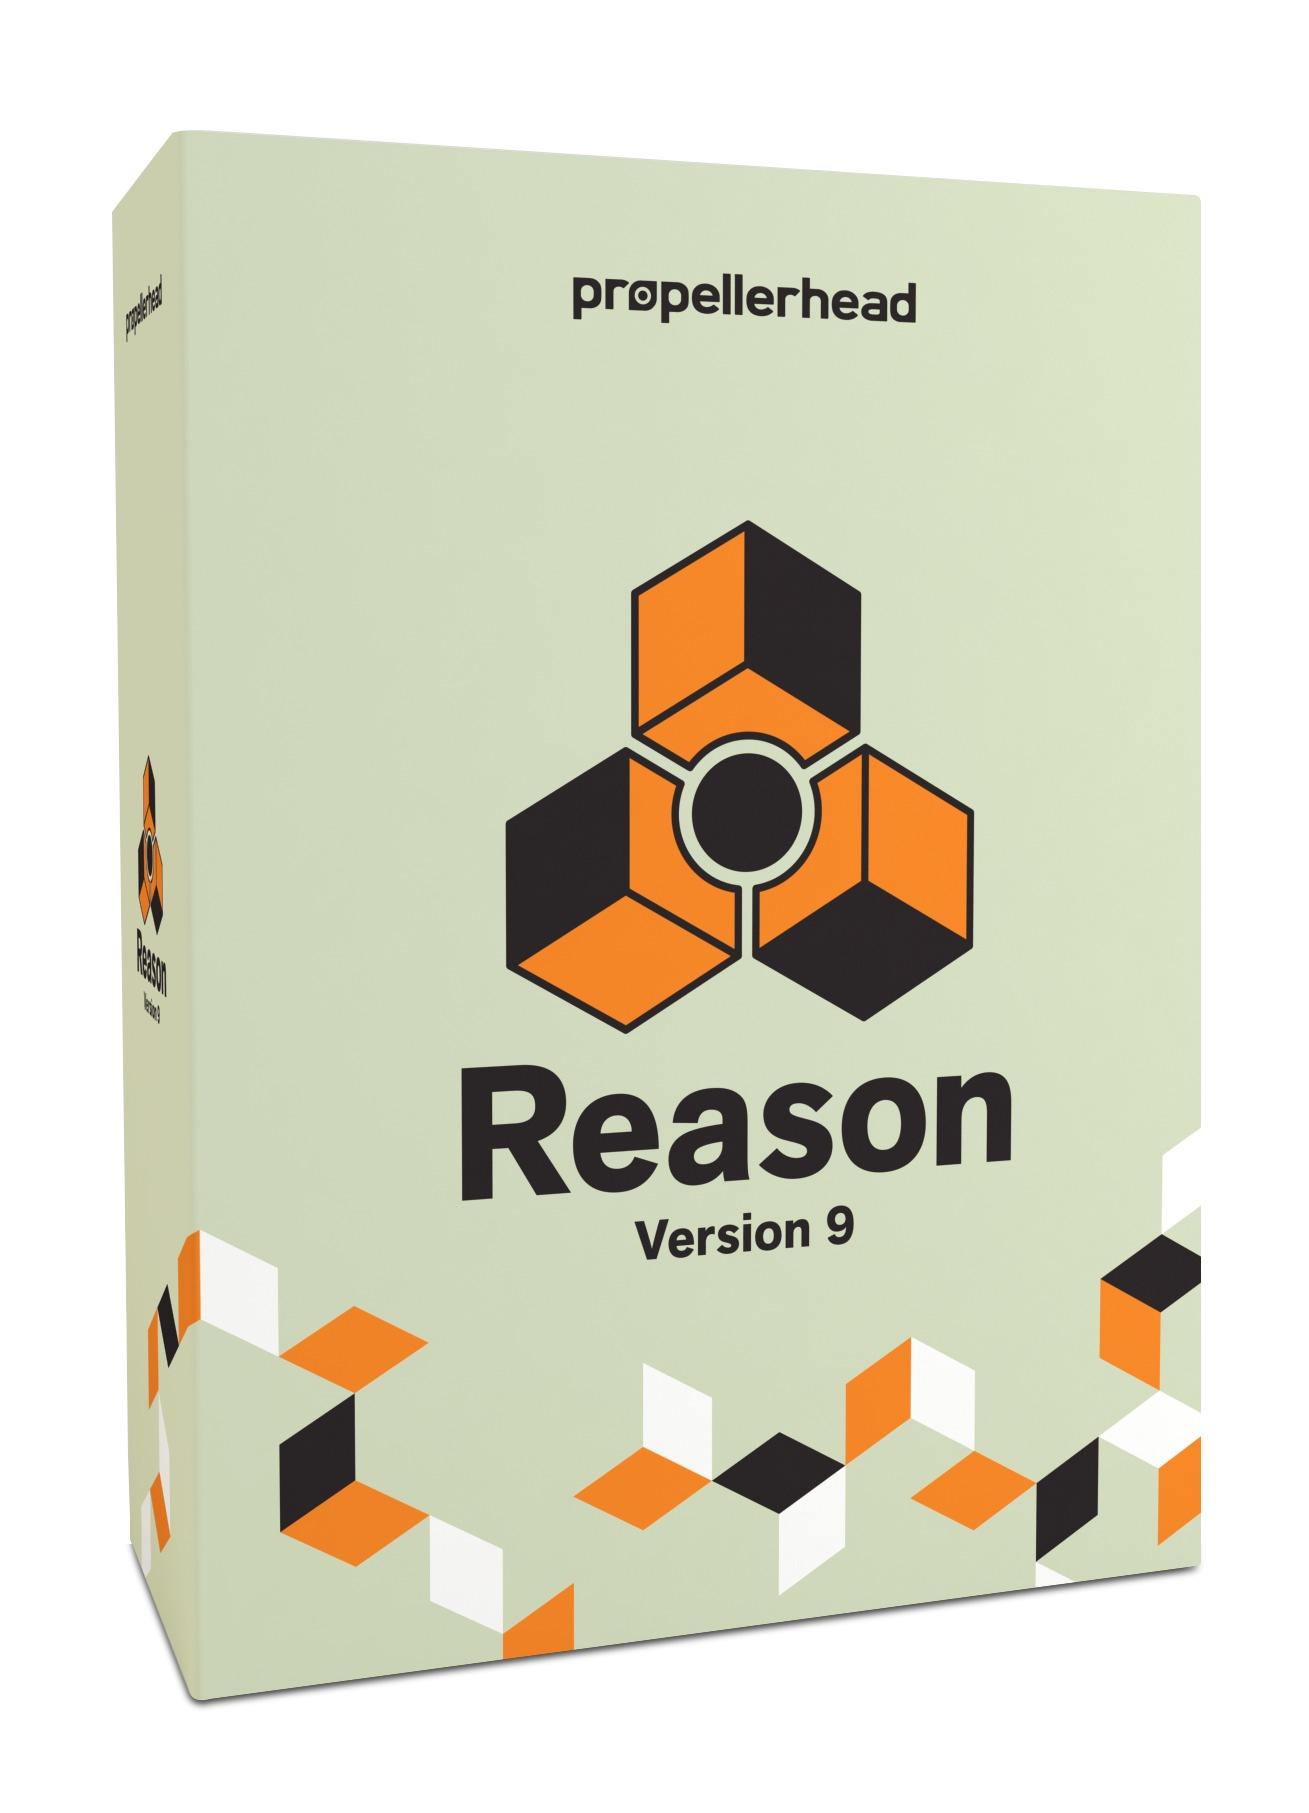 Propellerhead Reason 9